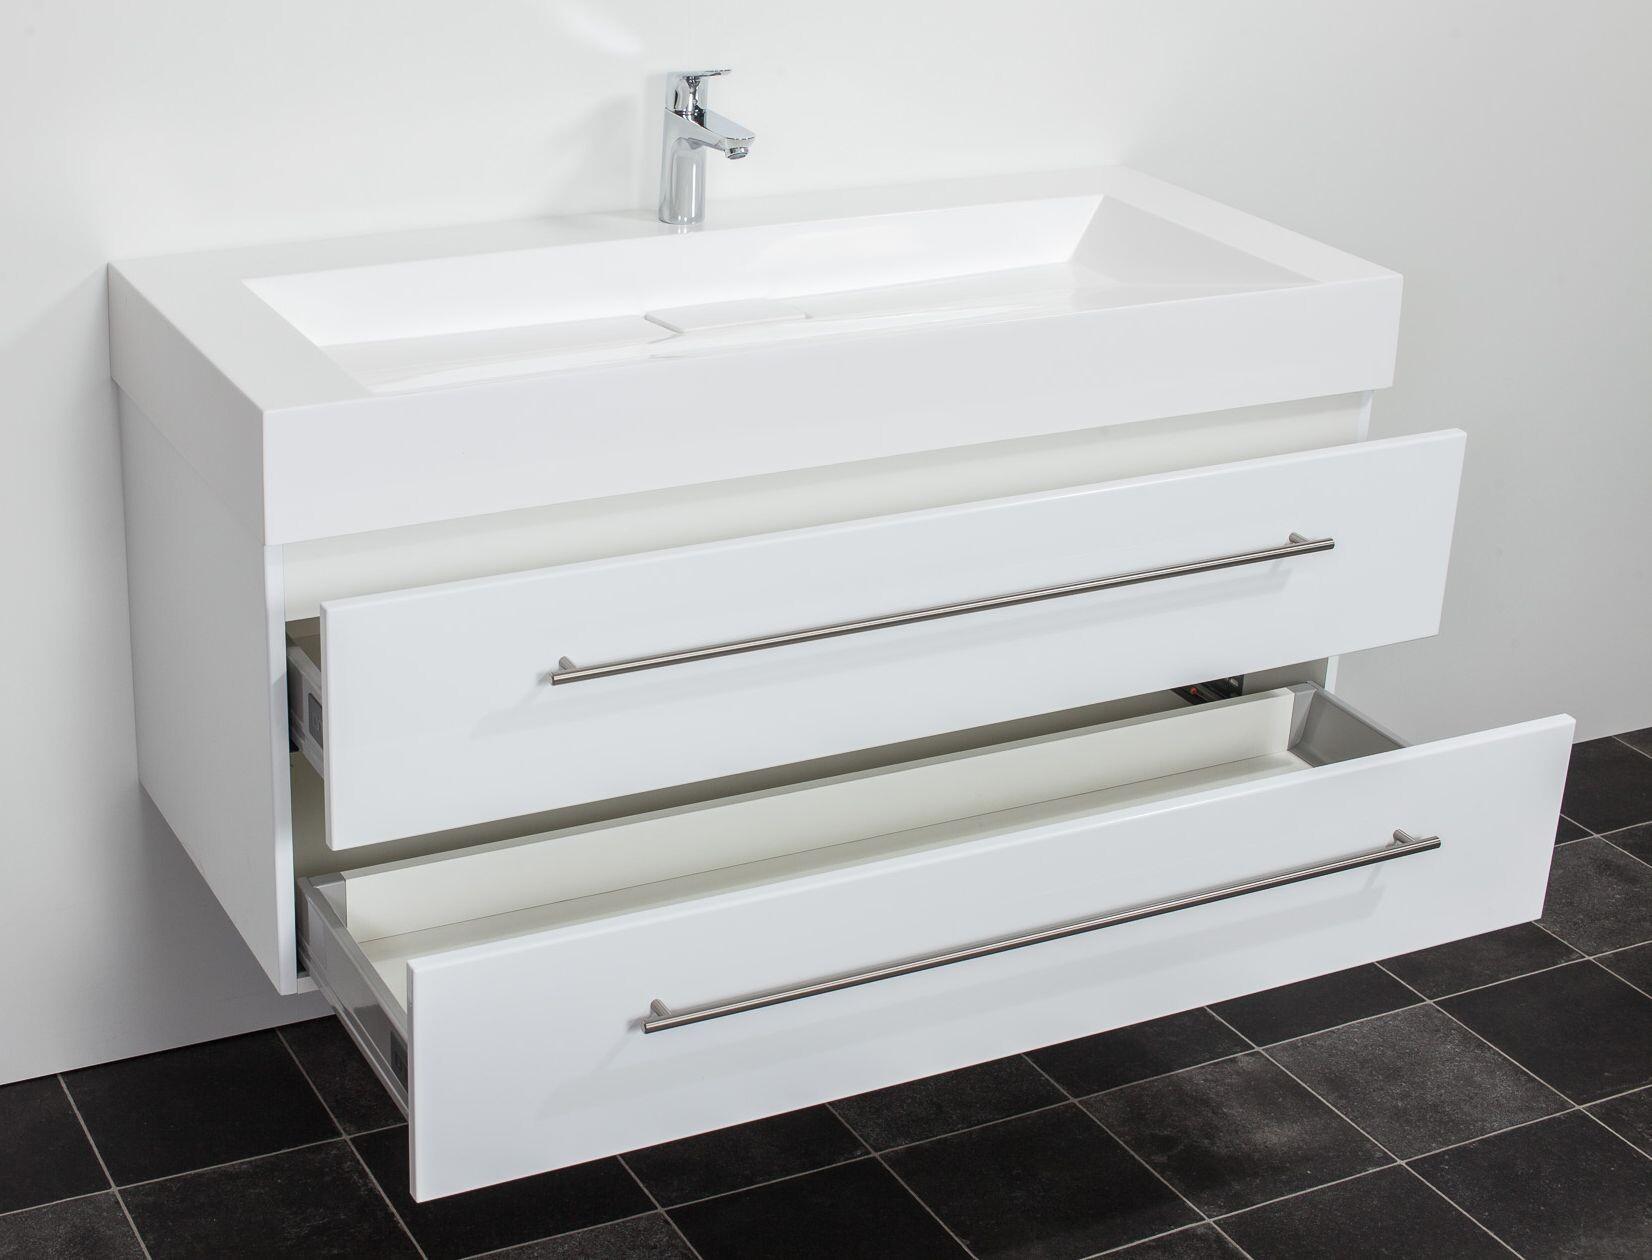 saniclear design wastafelmeubel 120cm 1 kraan hoogglans wit bs5077